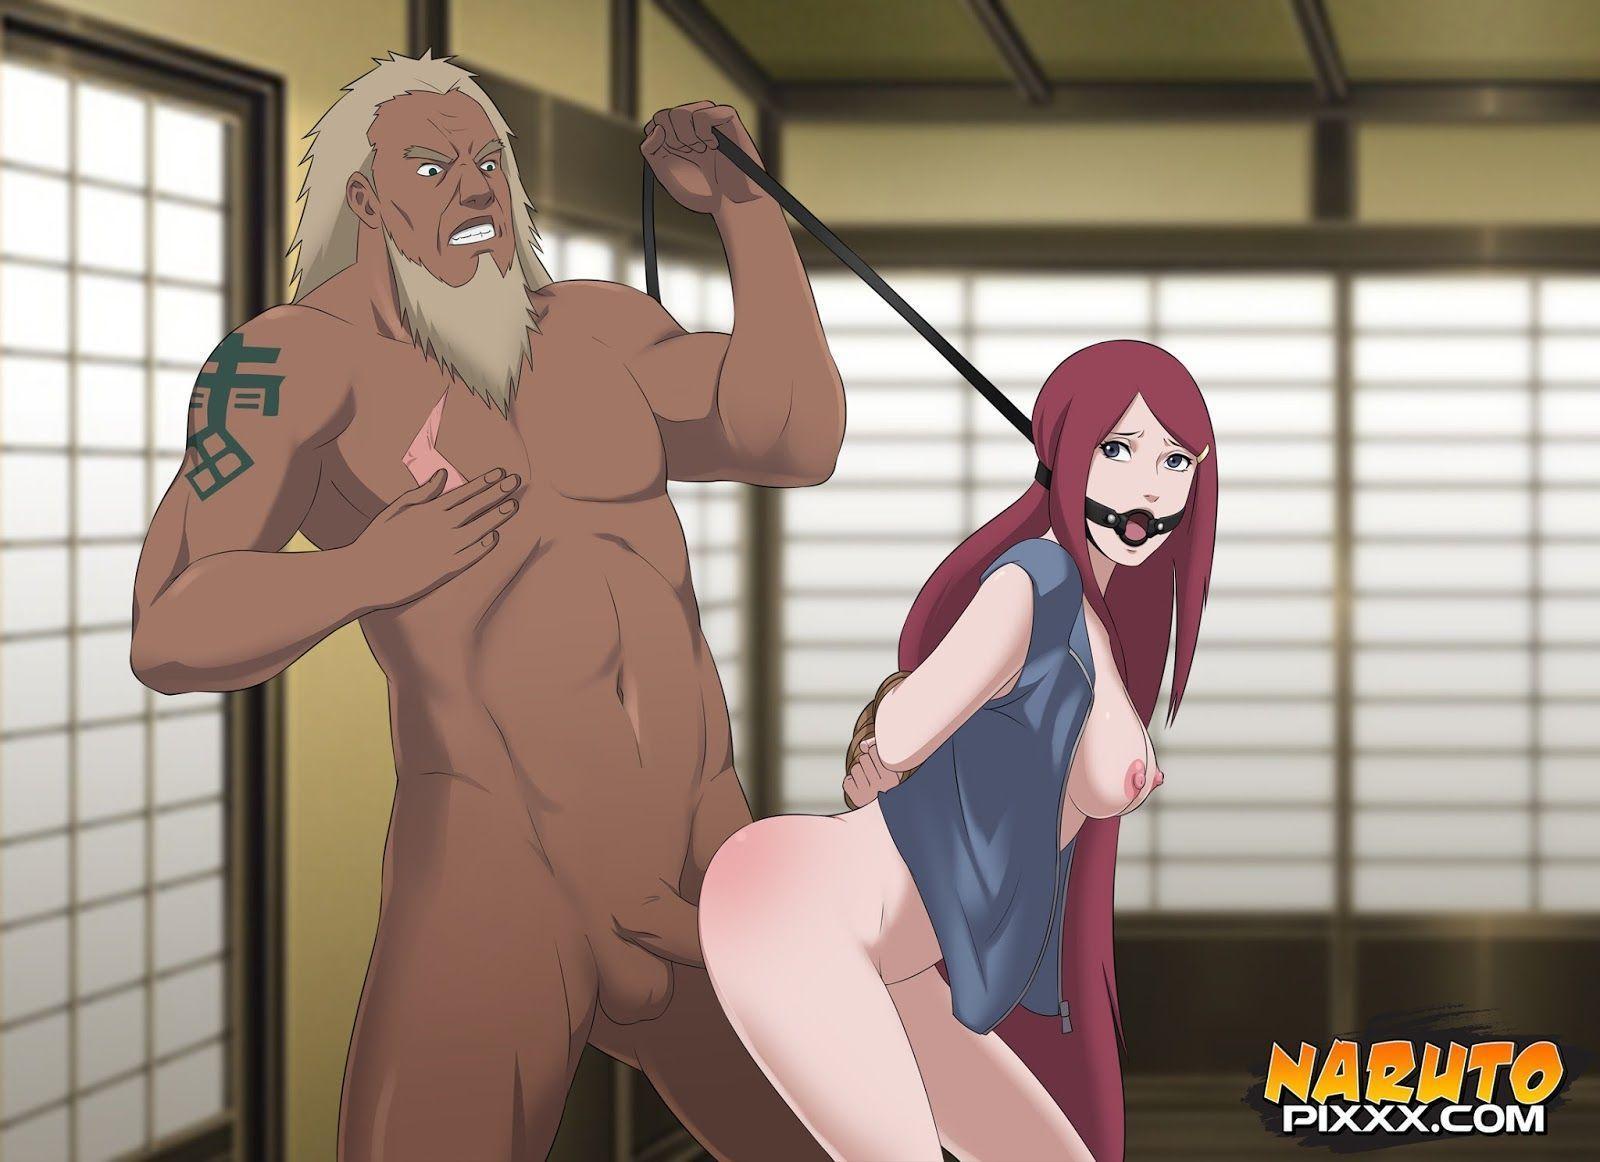 Naked boob butt